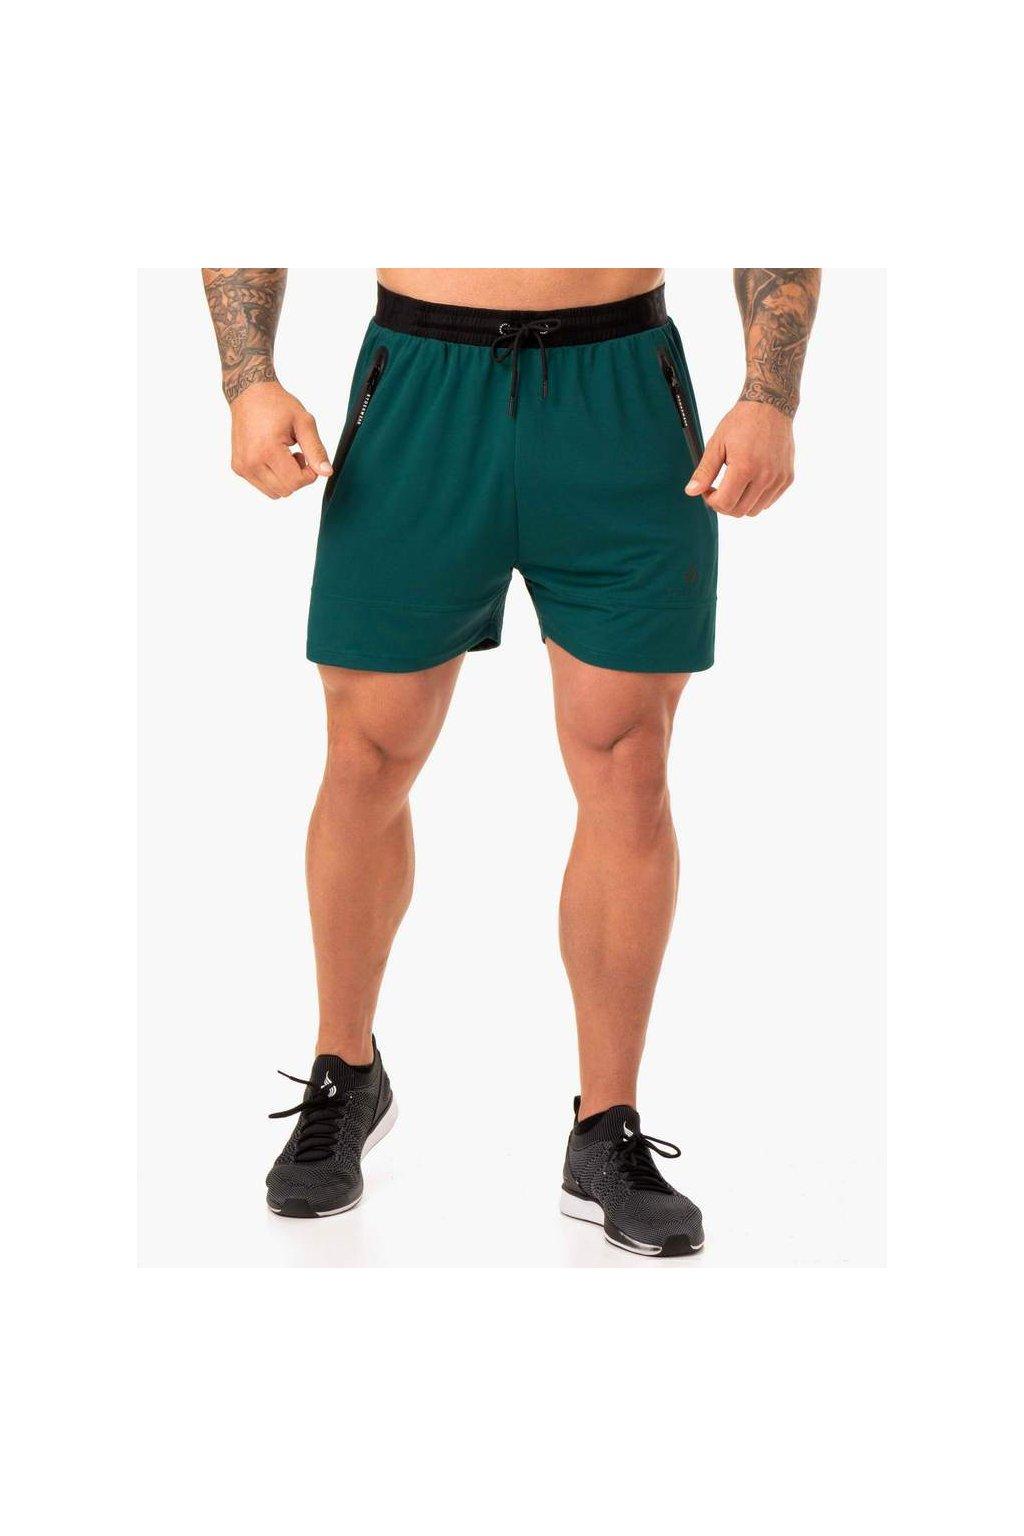 action mesh short emerald clothing ryderwear 191217 1000x1000